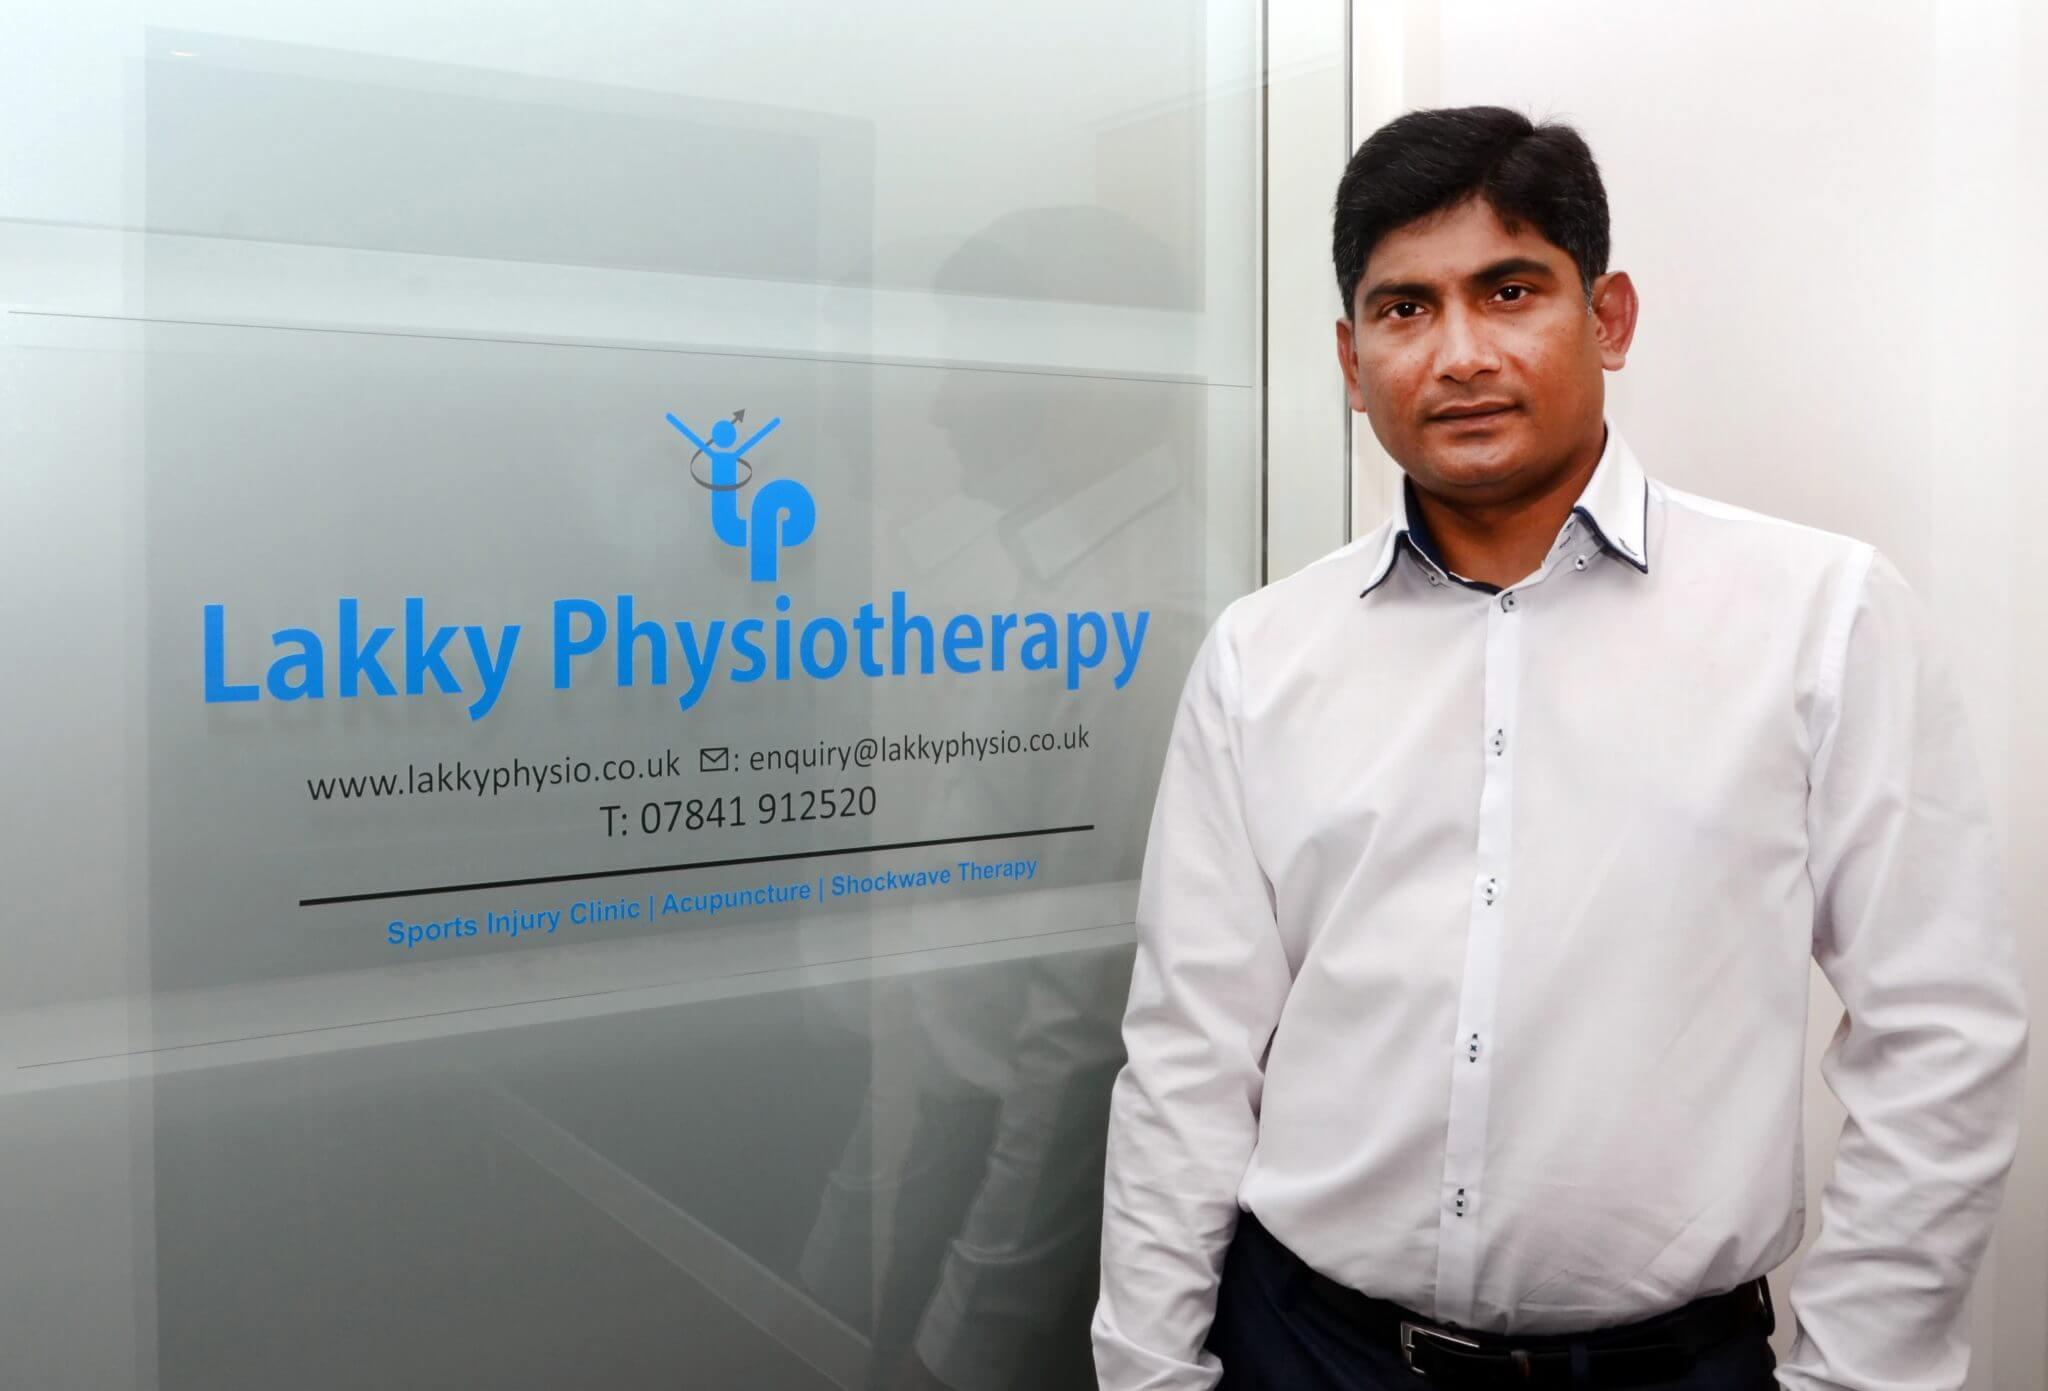 Mr Venkata R R Lakky